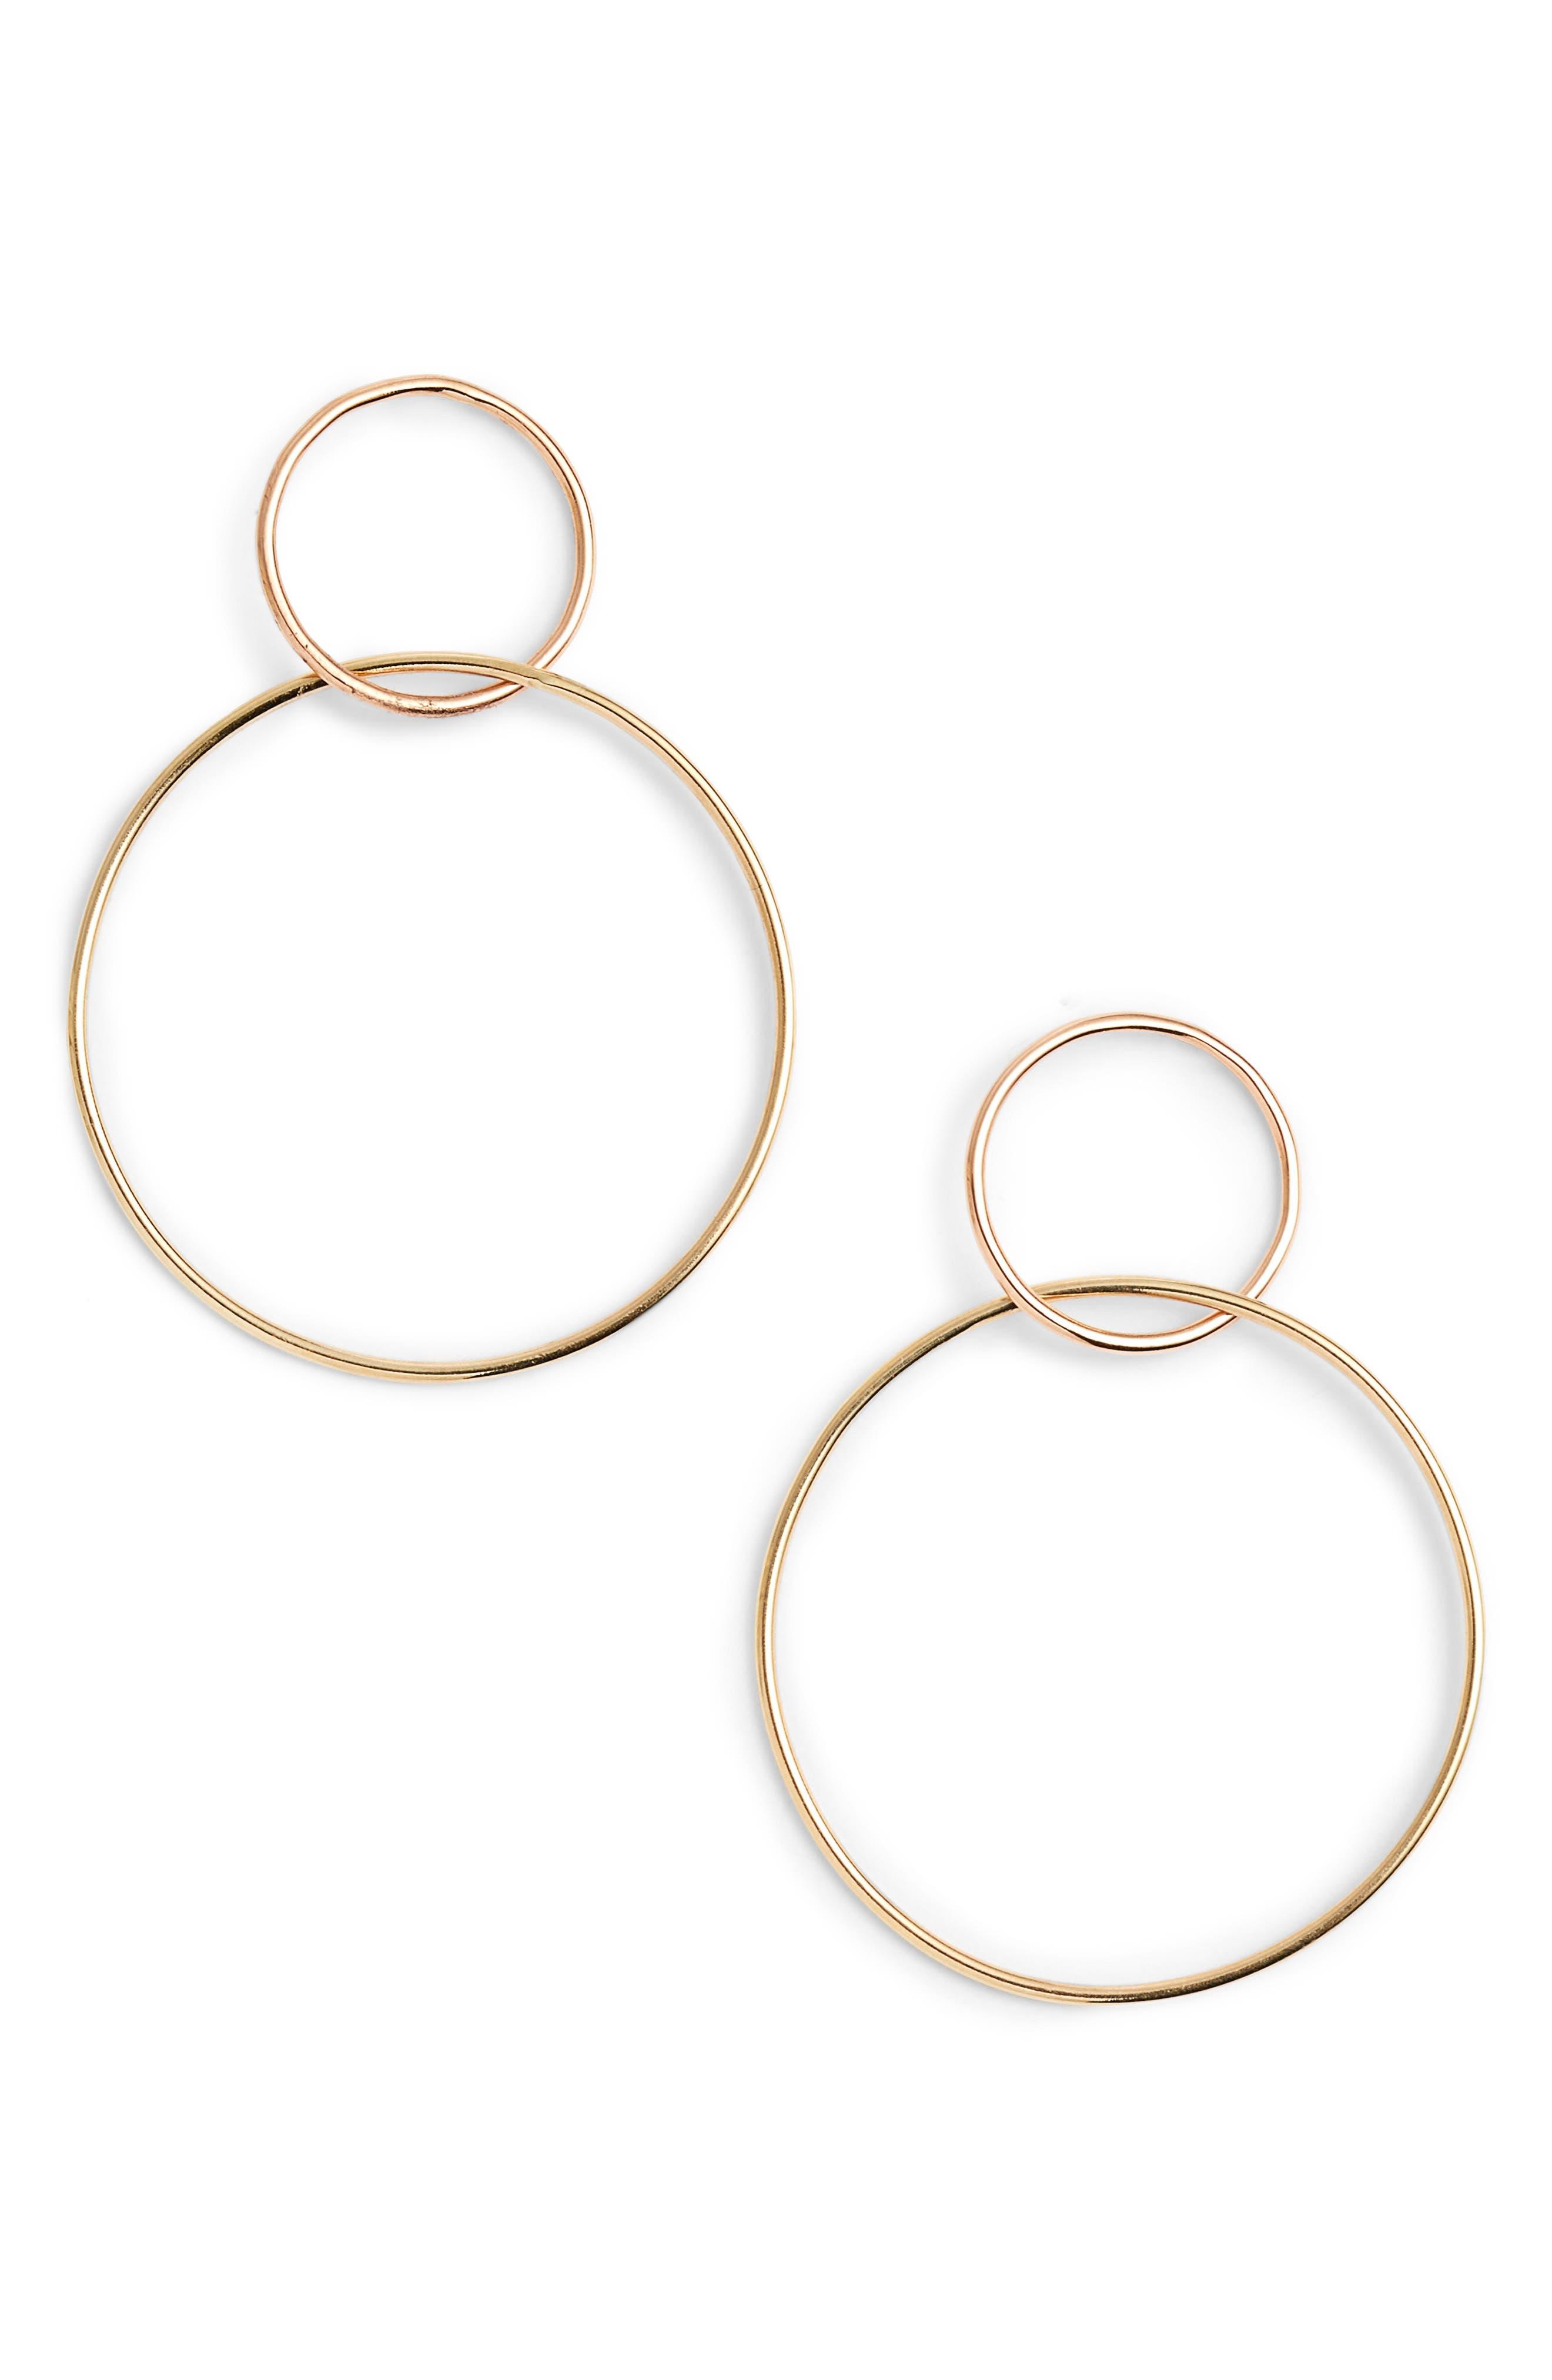 Alternate Image 1 Selected - Lana Jewelry Two Tone Double Loop Earrings